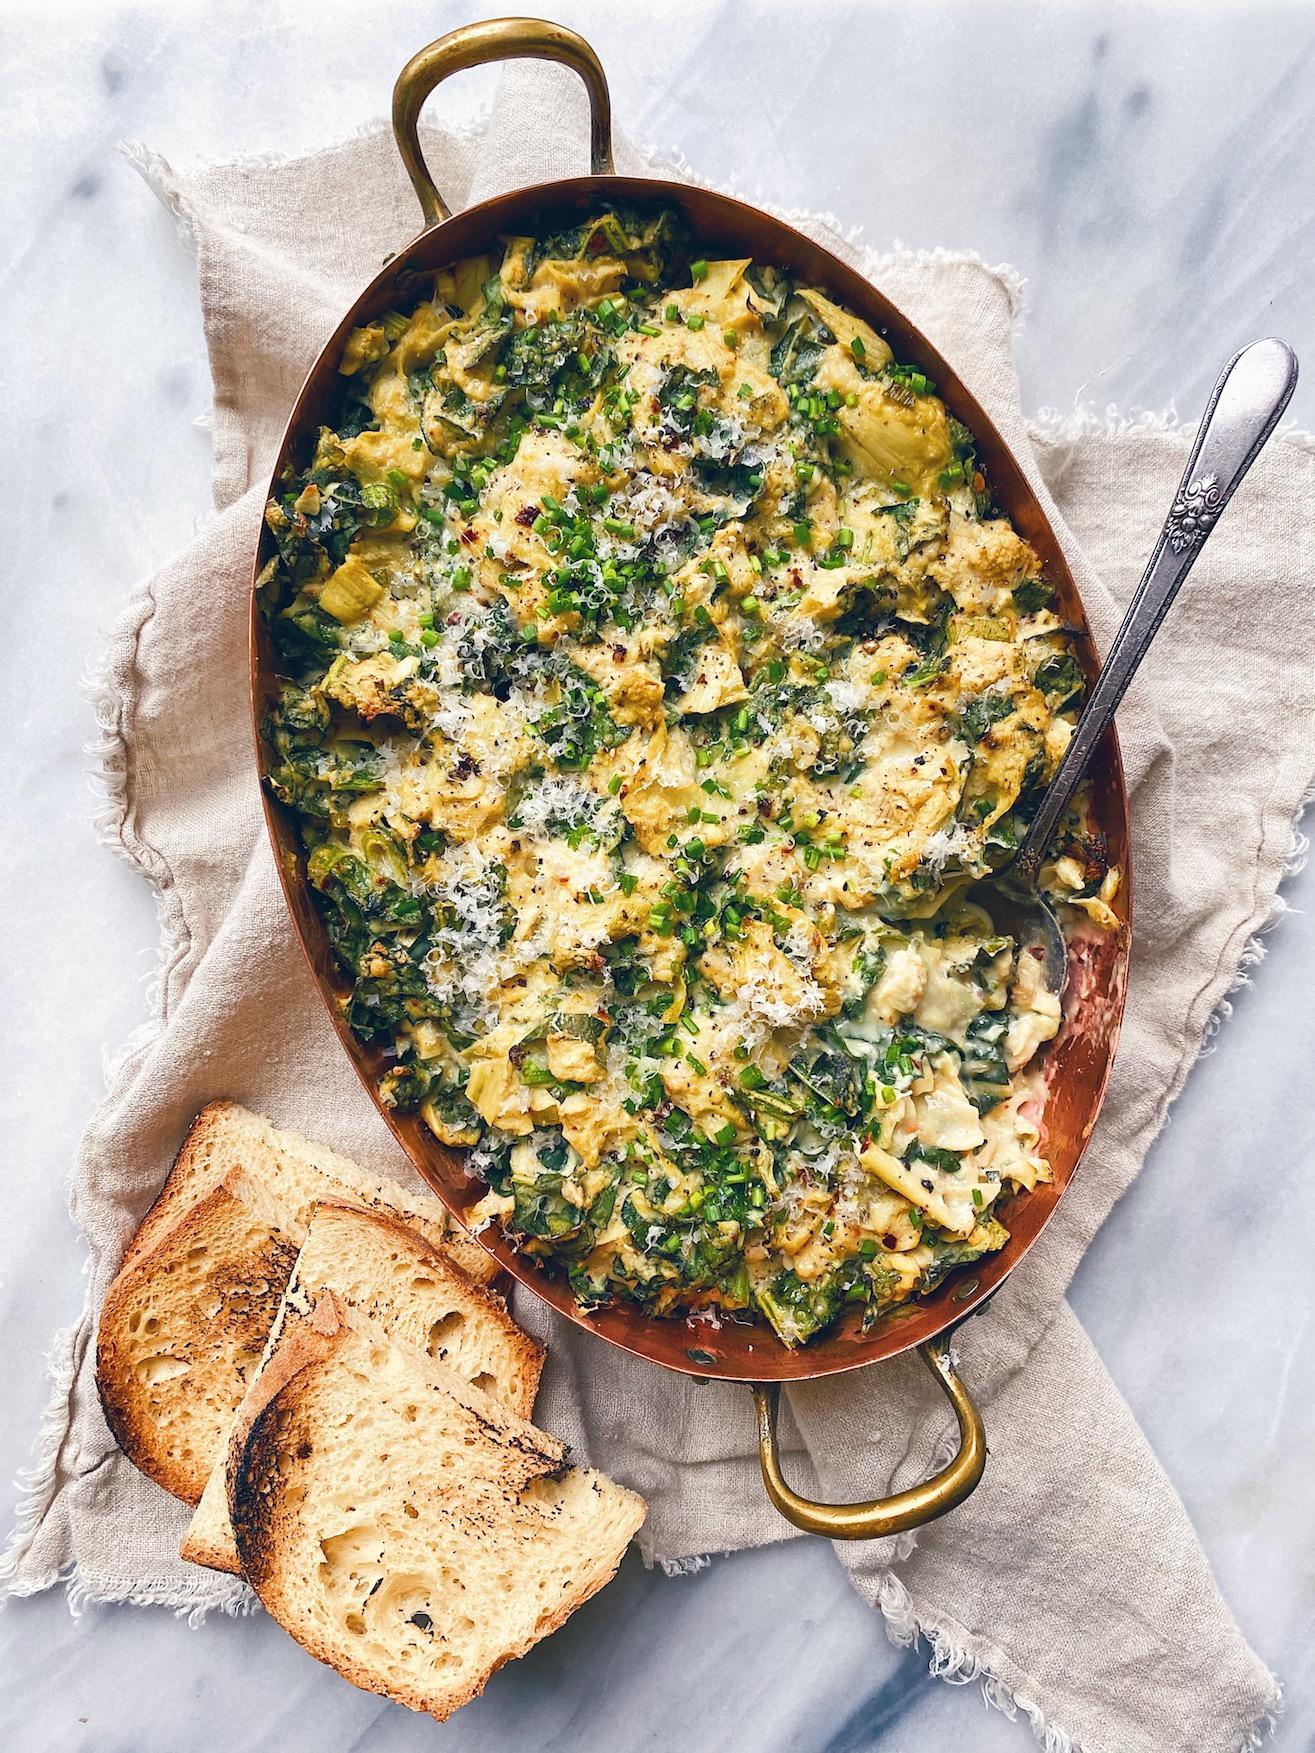 wu-haus-vegan-artichoke-kale-dip-baked